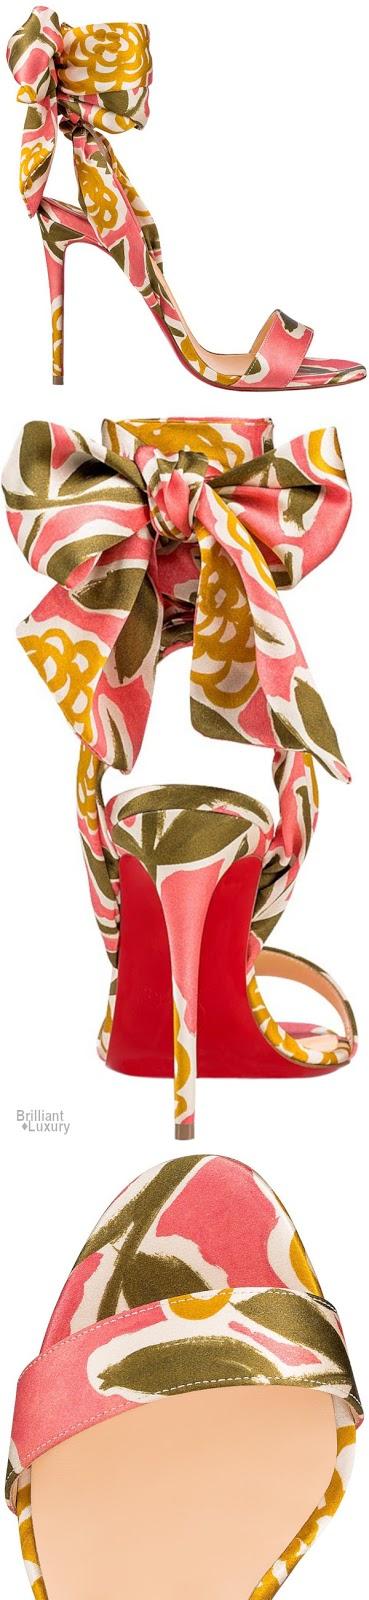 Brilliant Luxury♦Christian Louboutin Sandale Du Desert Satin Raoul Bow Pump